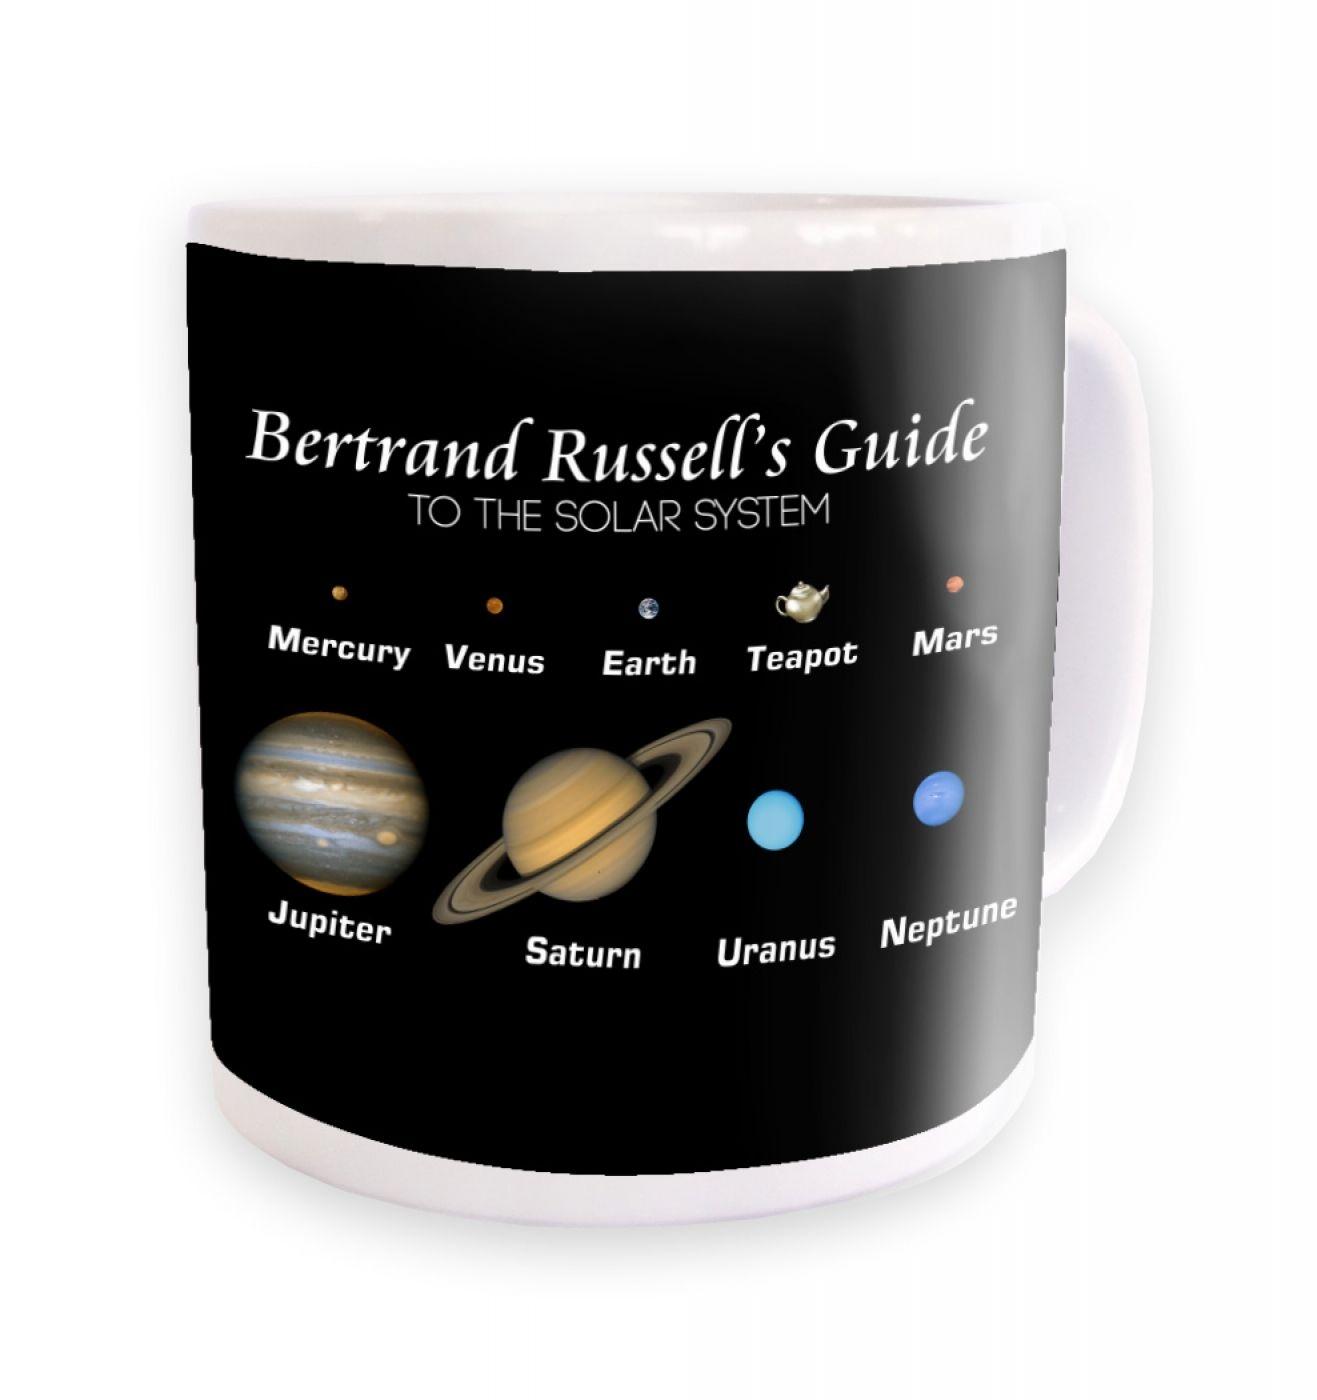 Bertrand Russell's Guide mug- black background